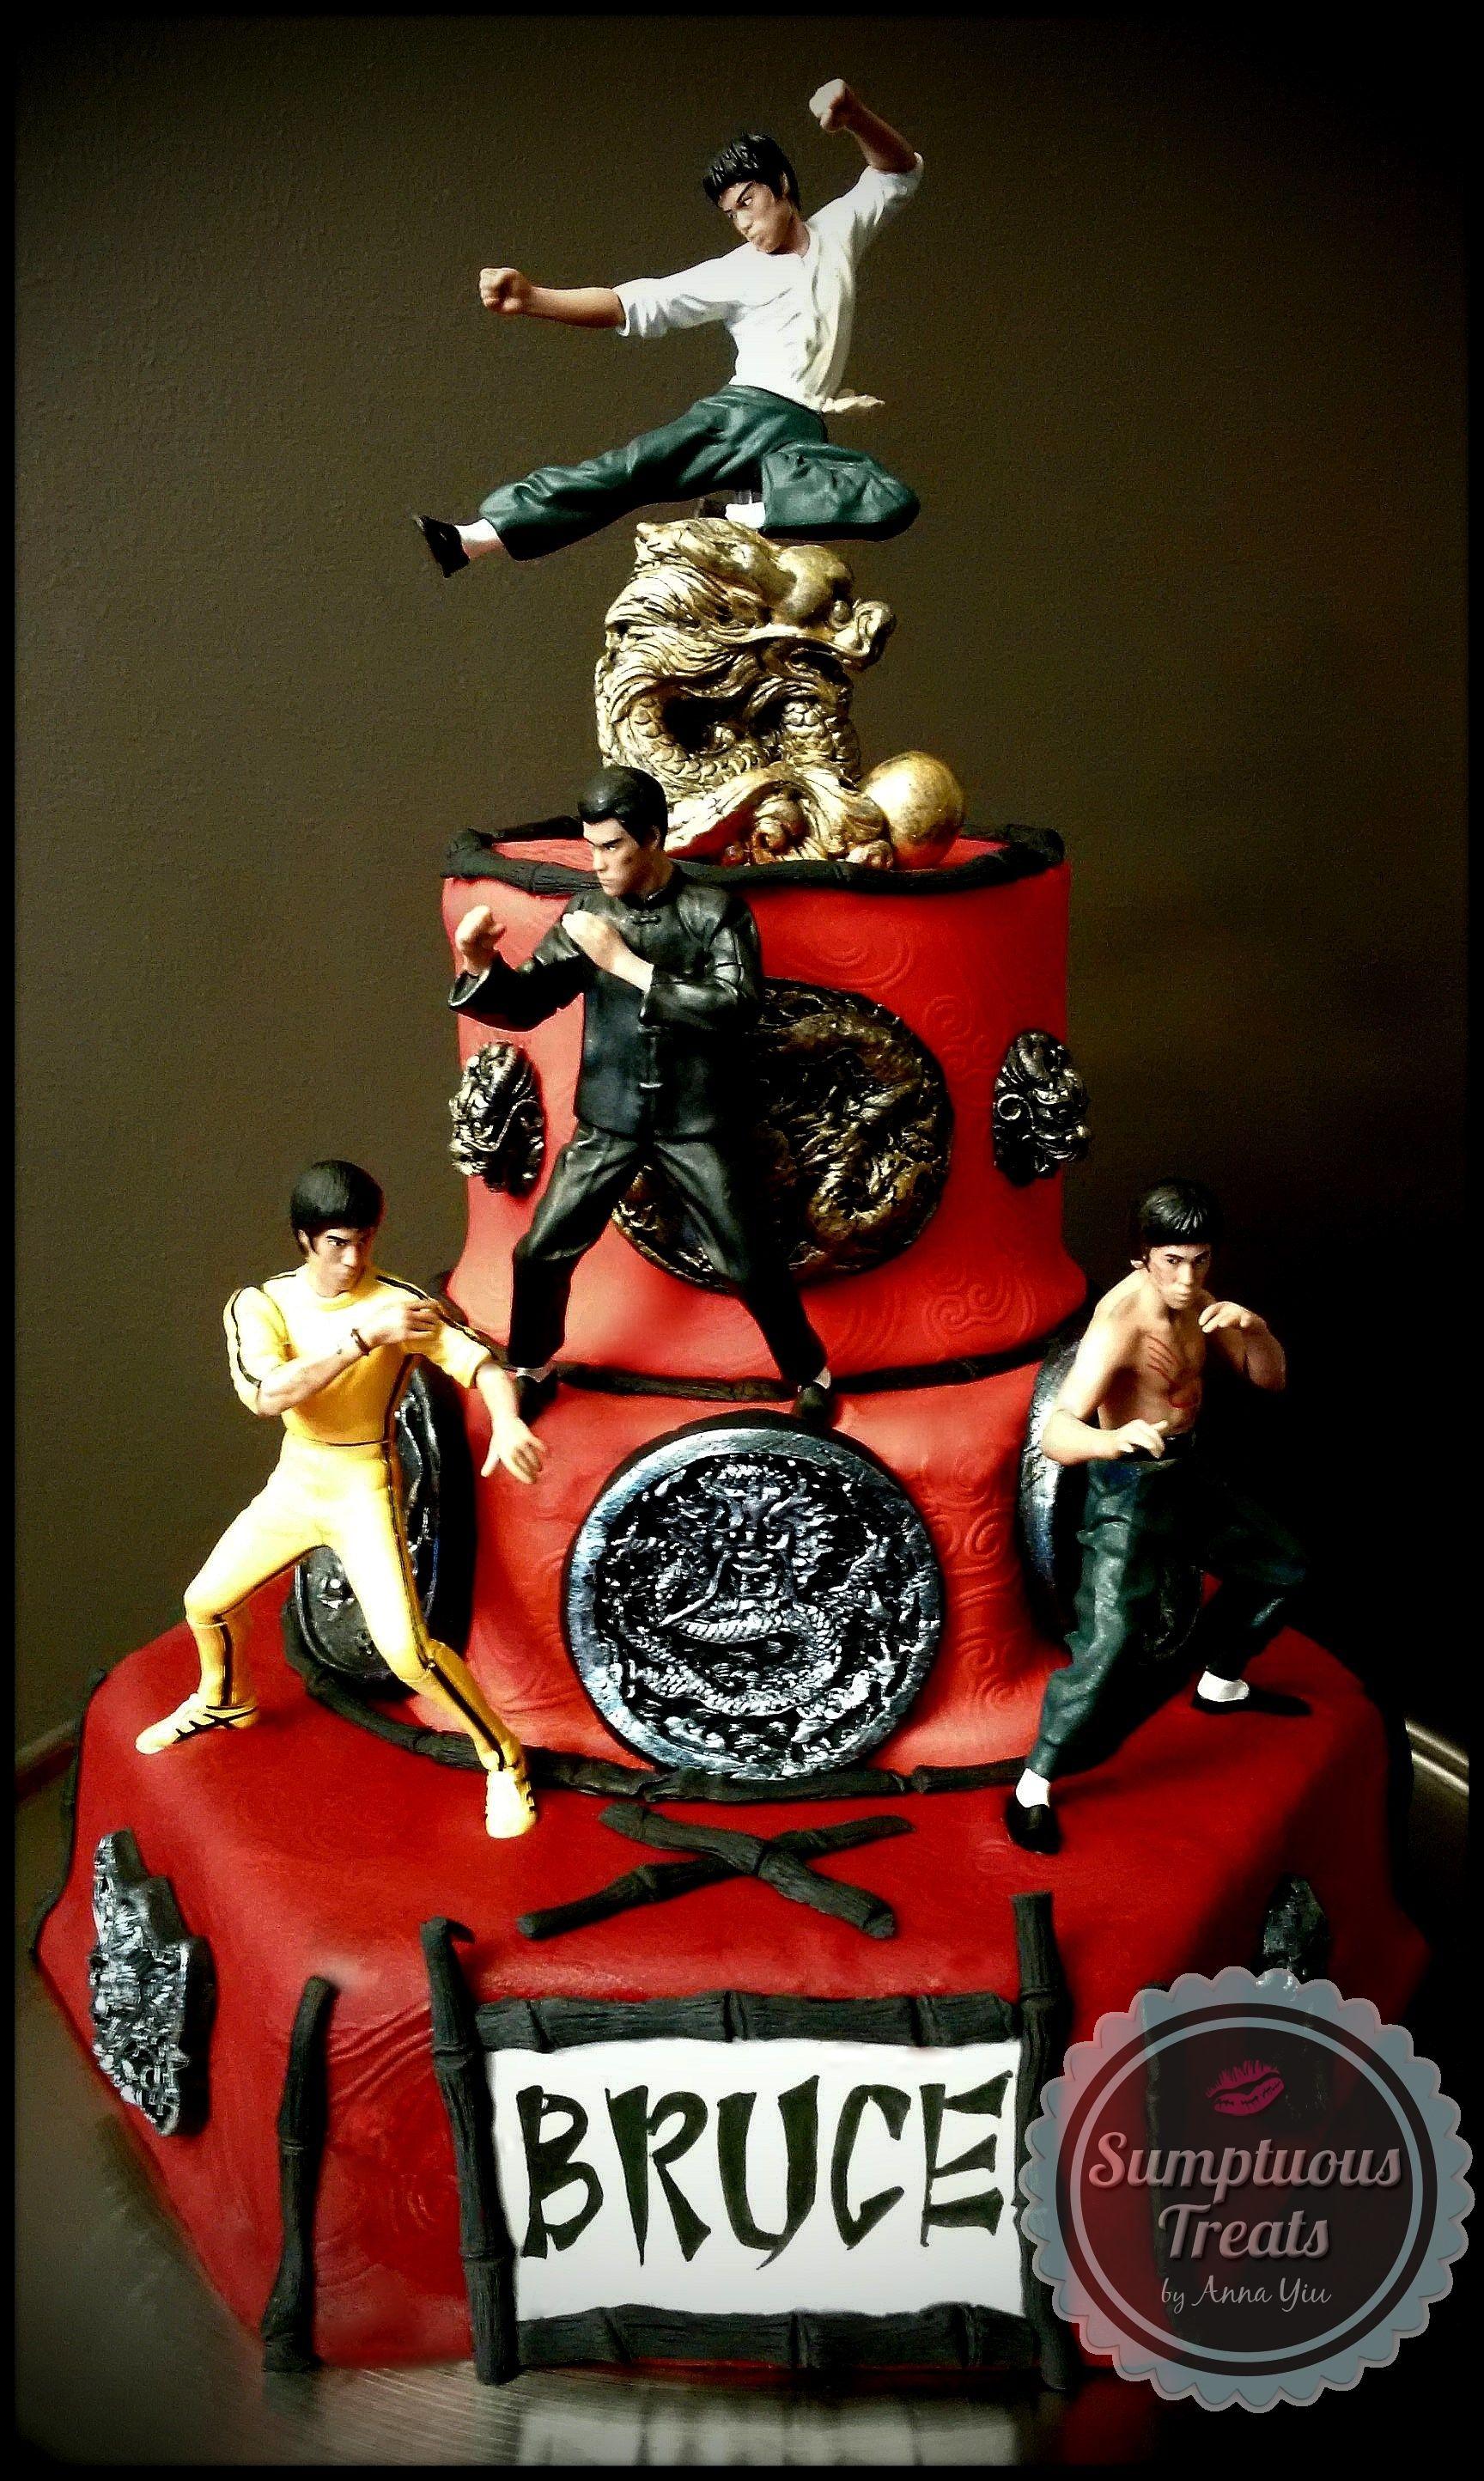 BRUCE LEE Cake CustomMadeToOrder Cakes Desserts Edible Art